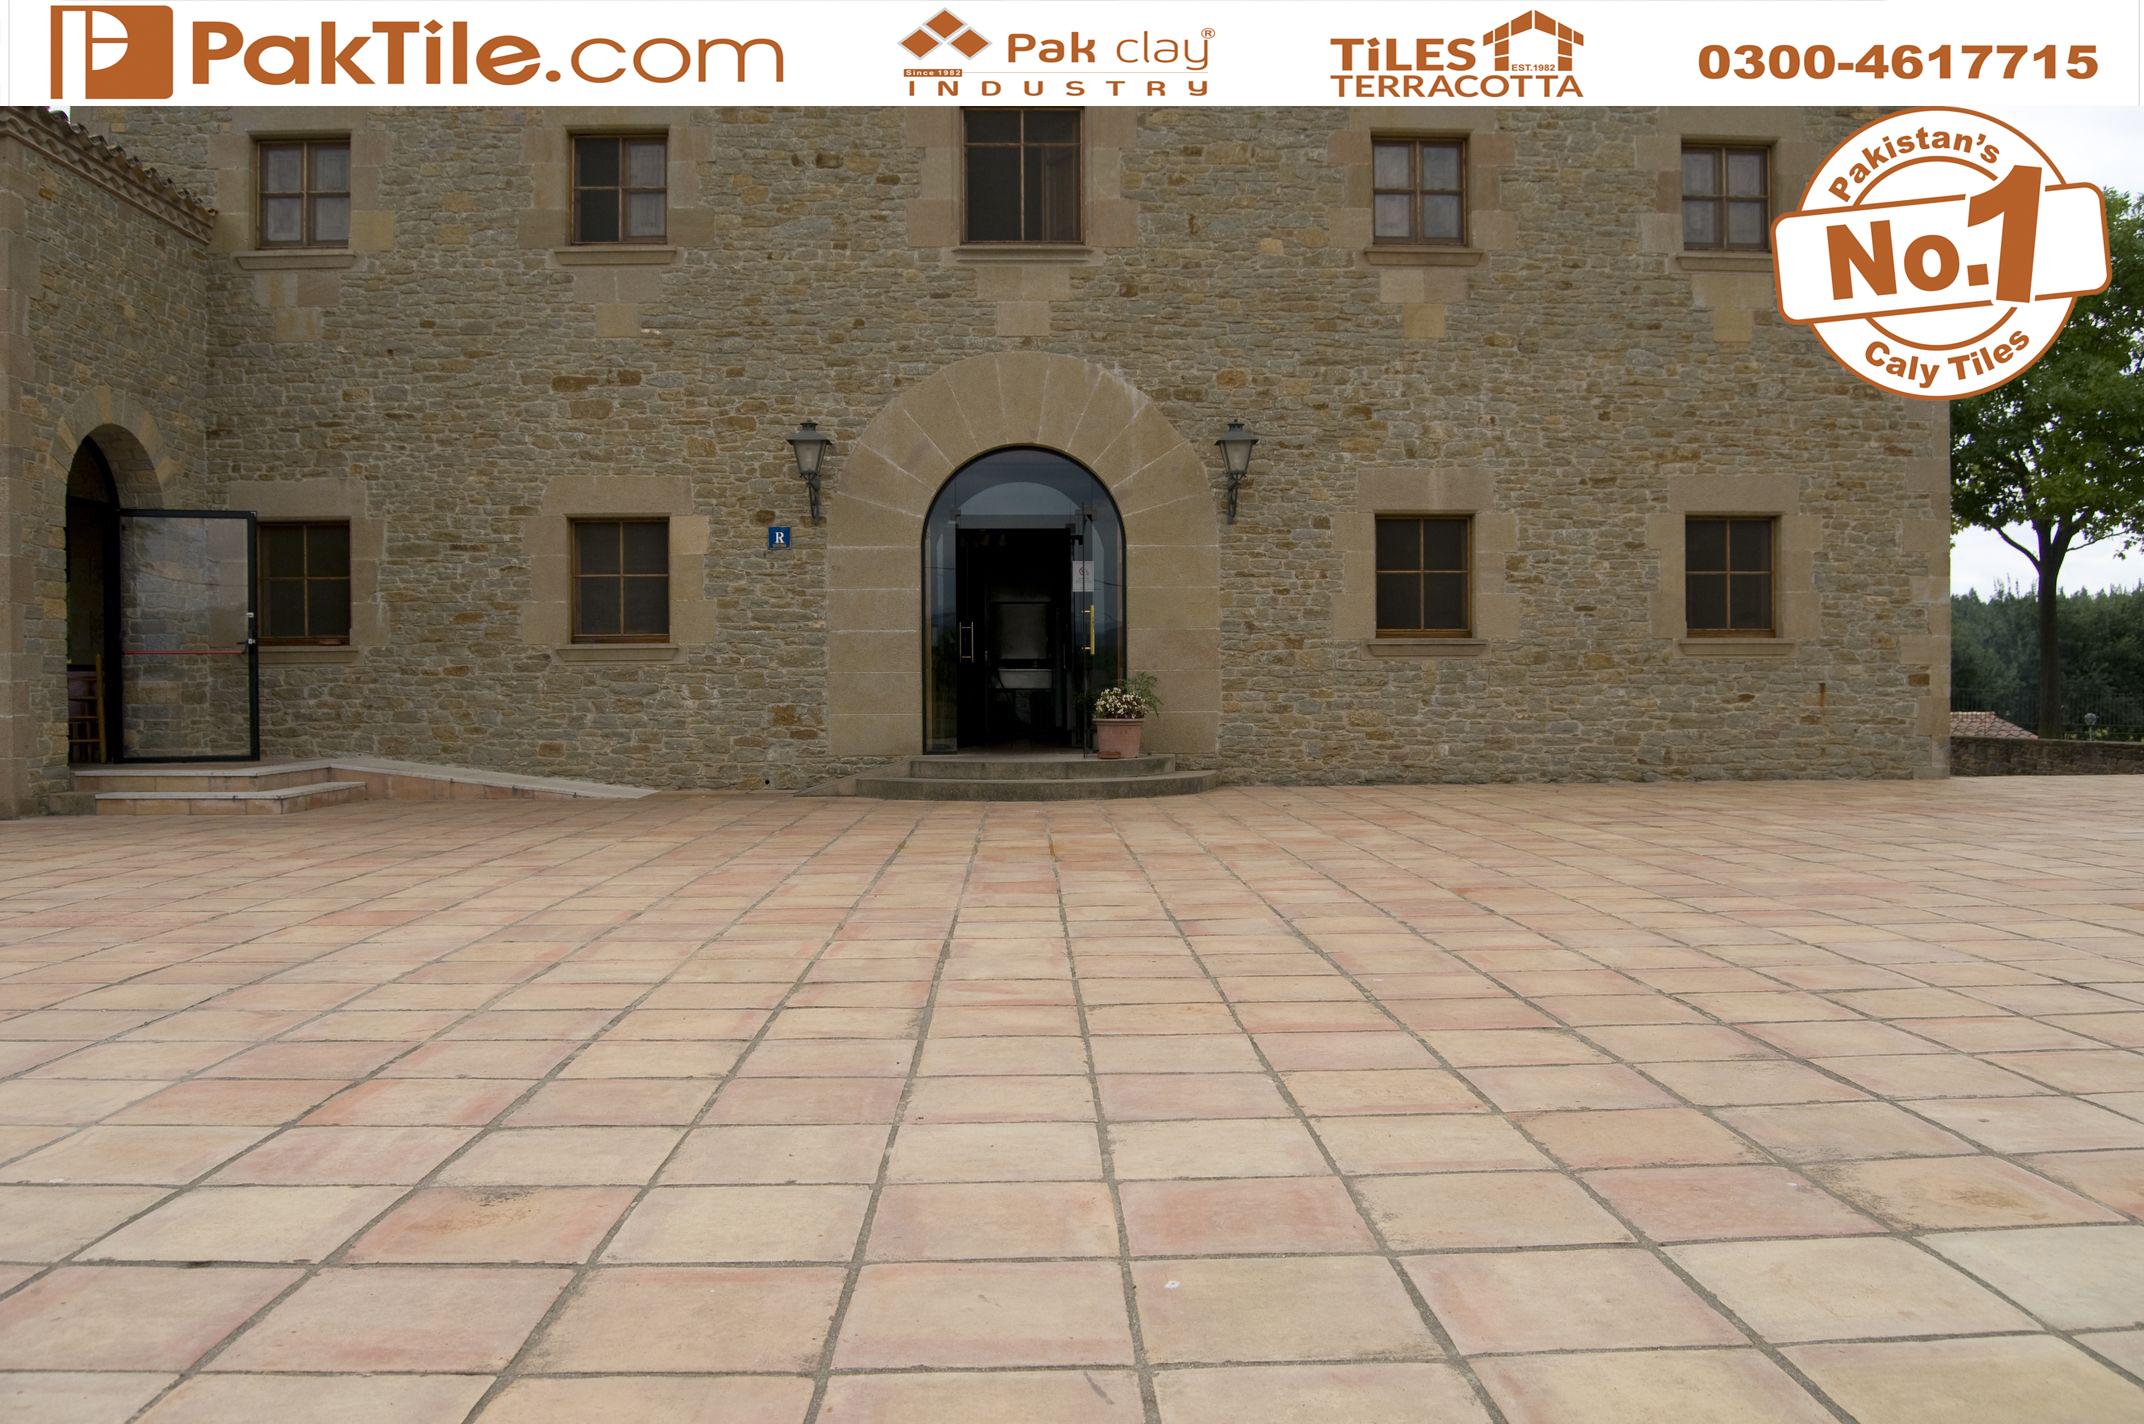 4 Pak Clay Tiles Islamabad Outdoor Flooring Tiles Design Pakistan Images.